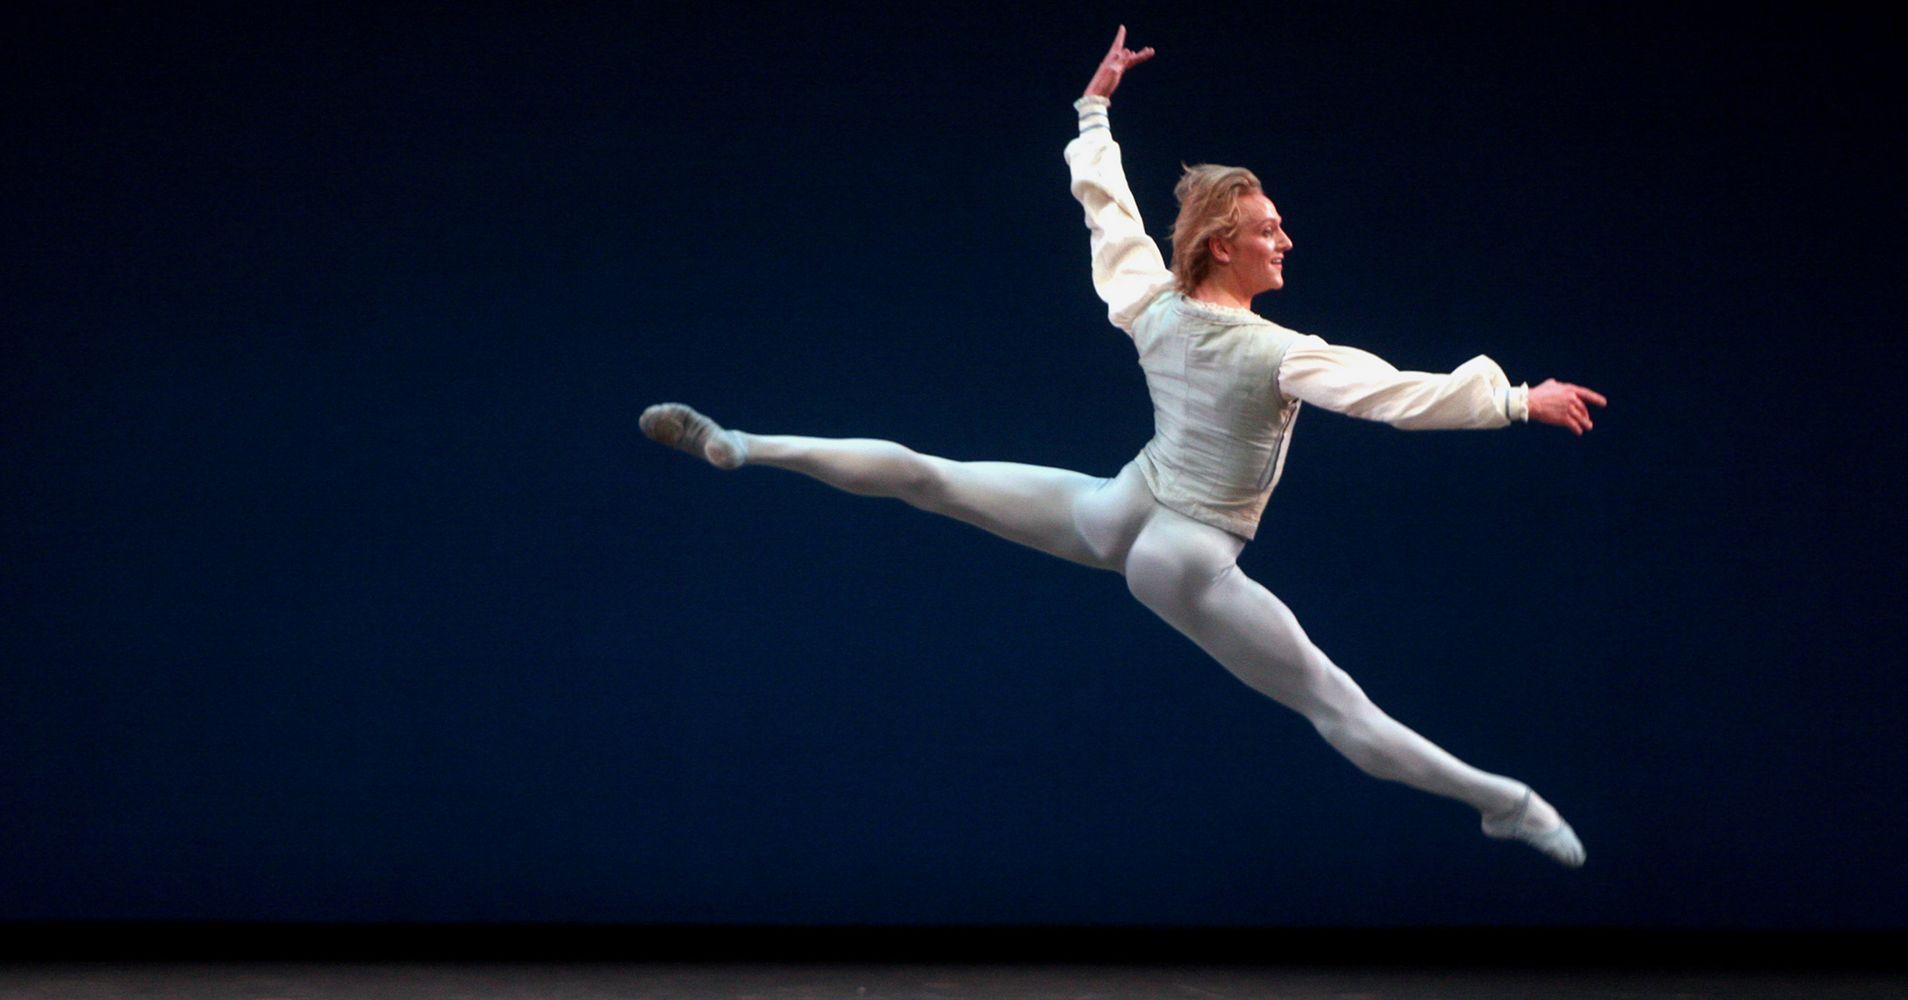 Keith Lee Dances: Former American Ballet Theatre soloist